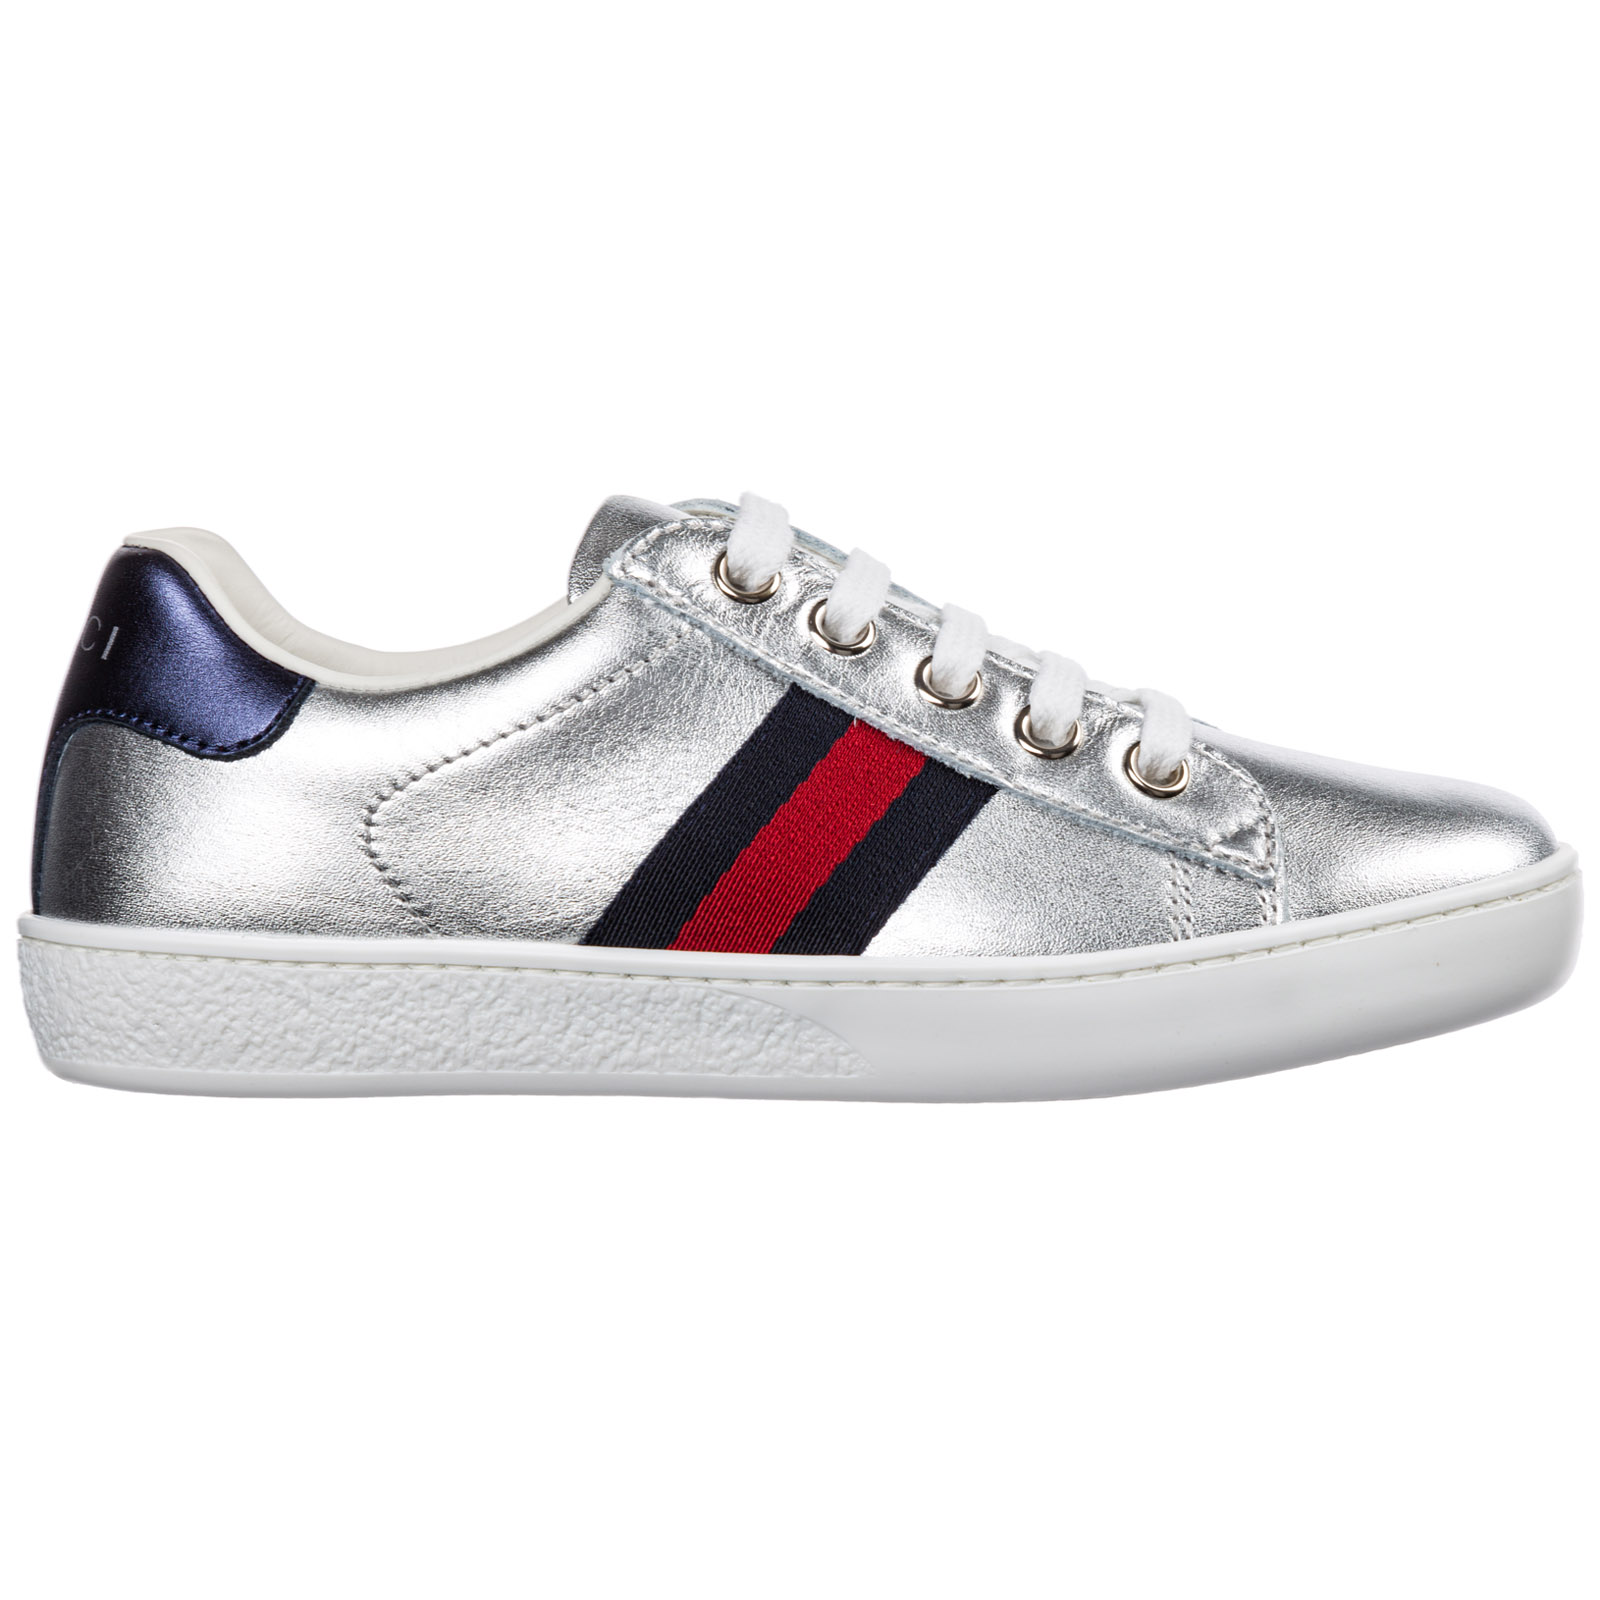 buy online c4be2 81a71 Babyschuhe sneakers kinder baby schuhe mädchen leder turnschuhe ace